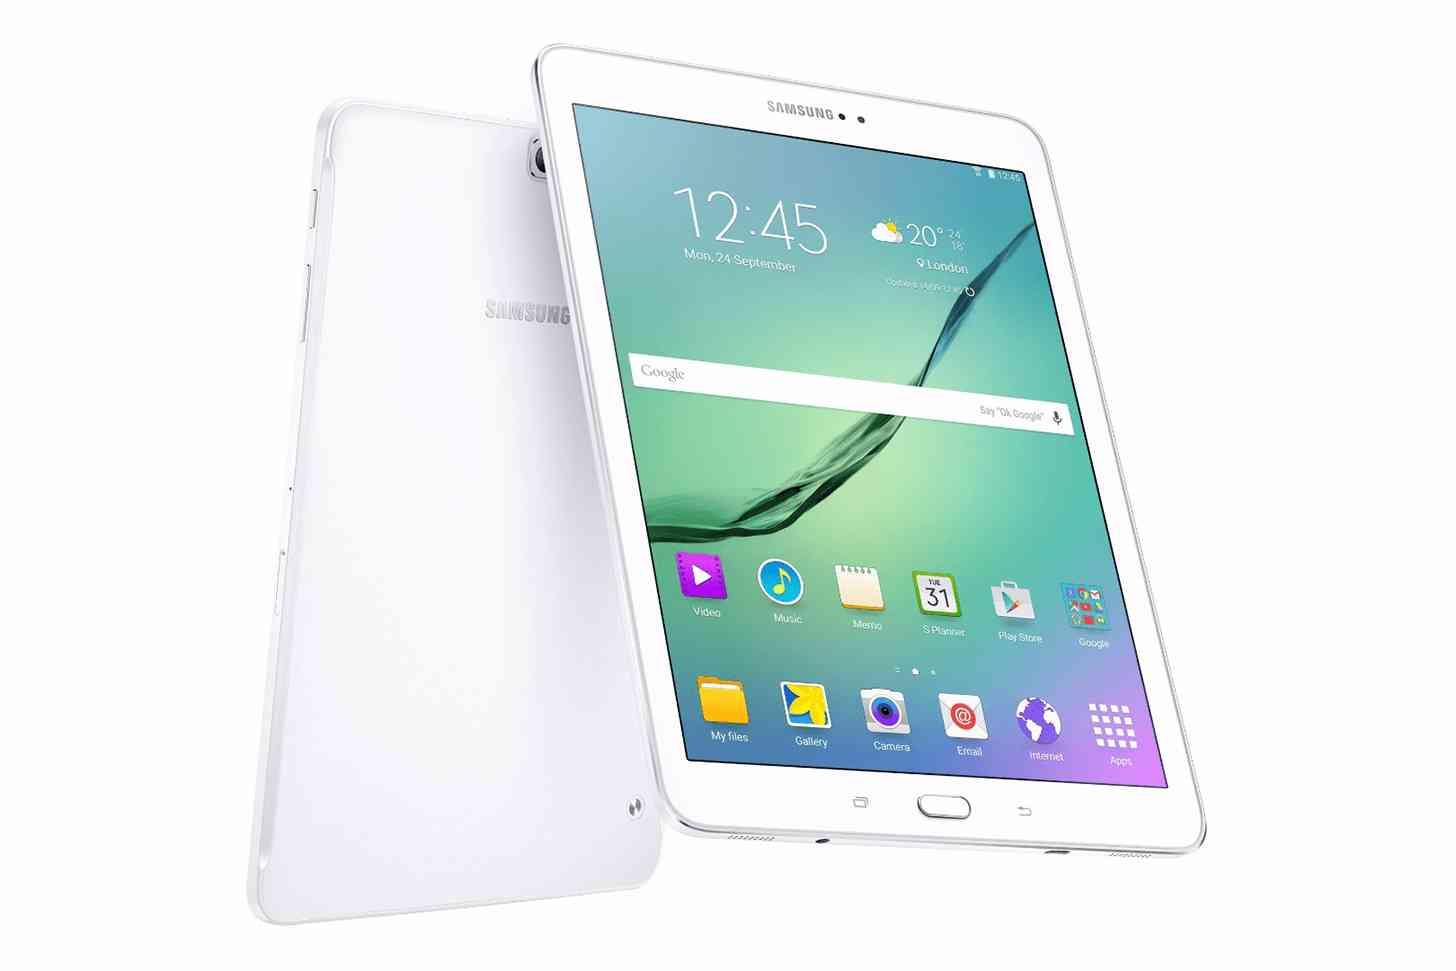 Samsung Galaxy Tab S2 9.7 white large